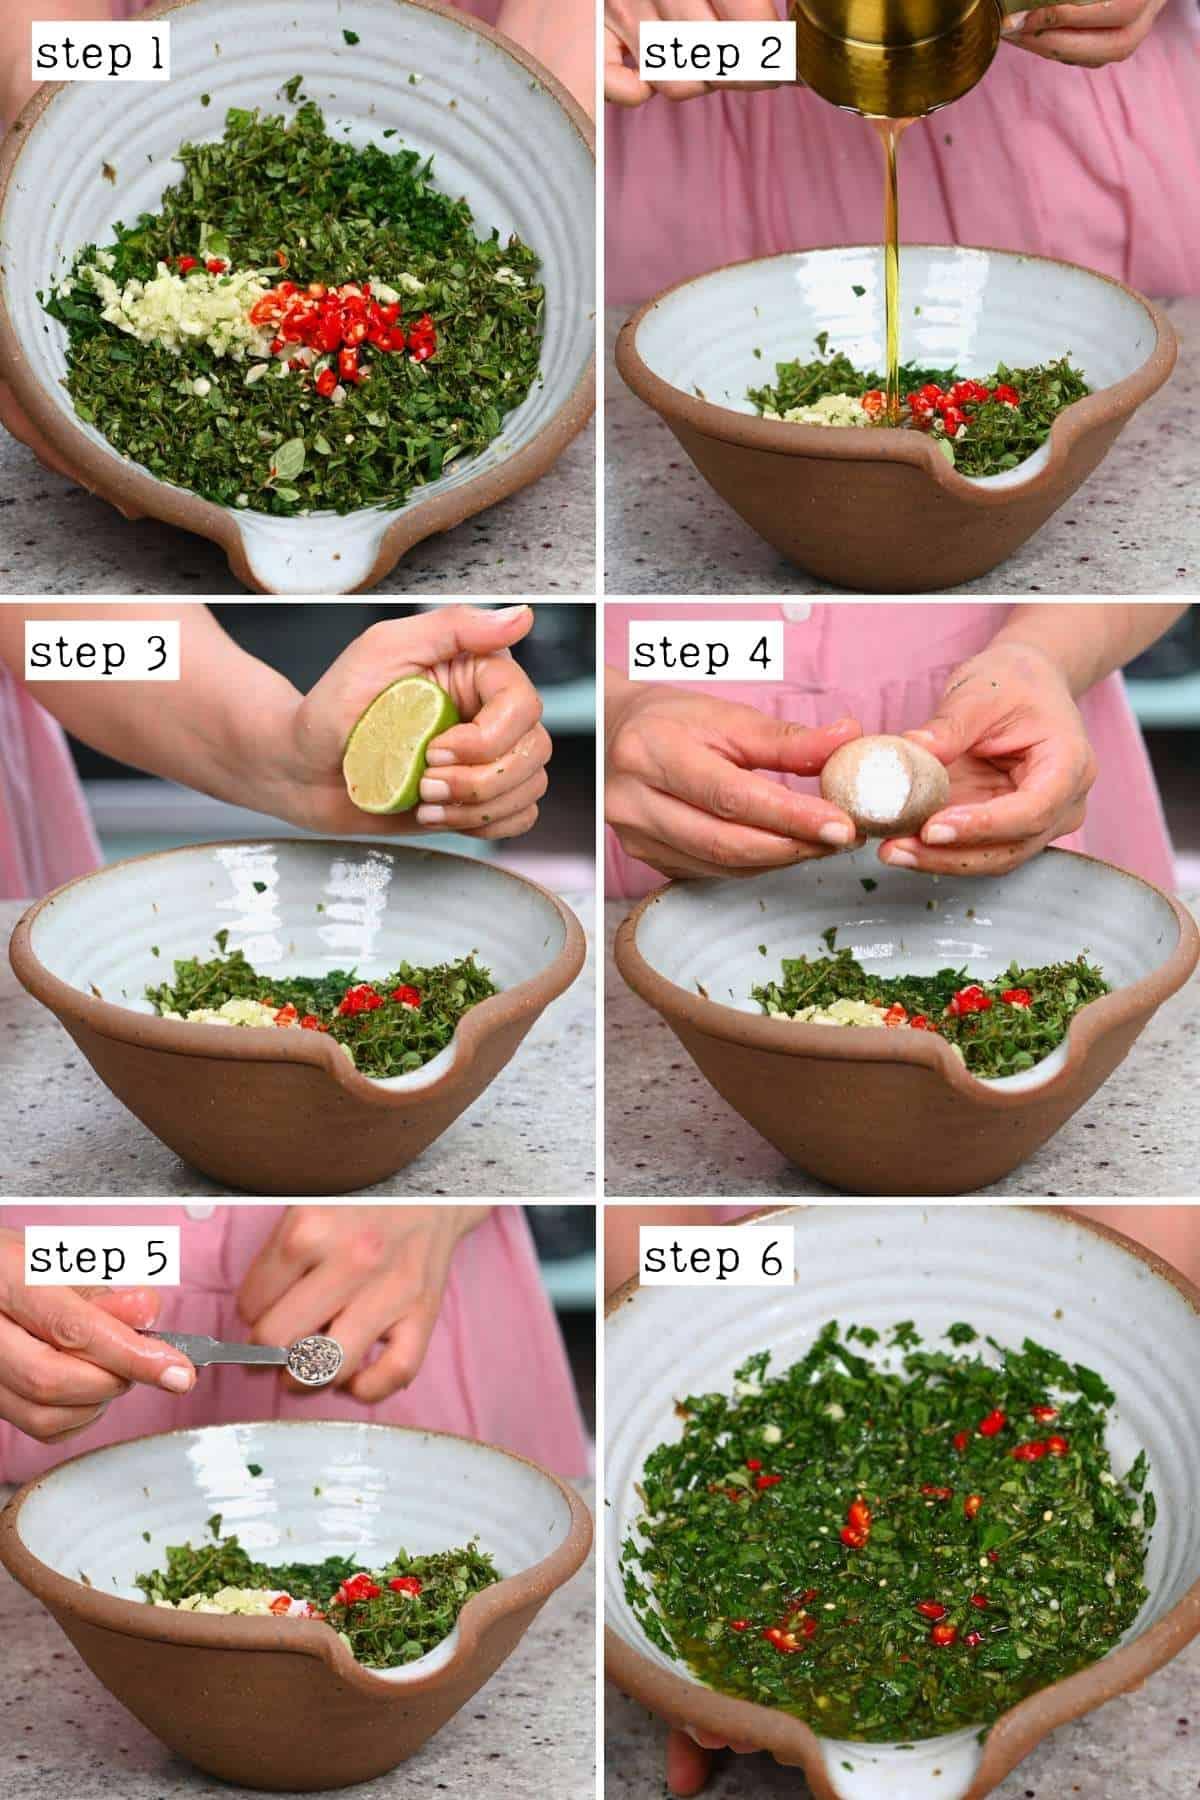 Steps for making chimichurri